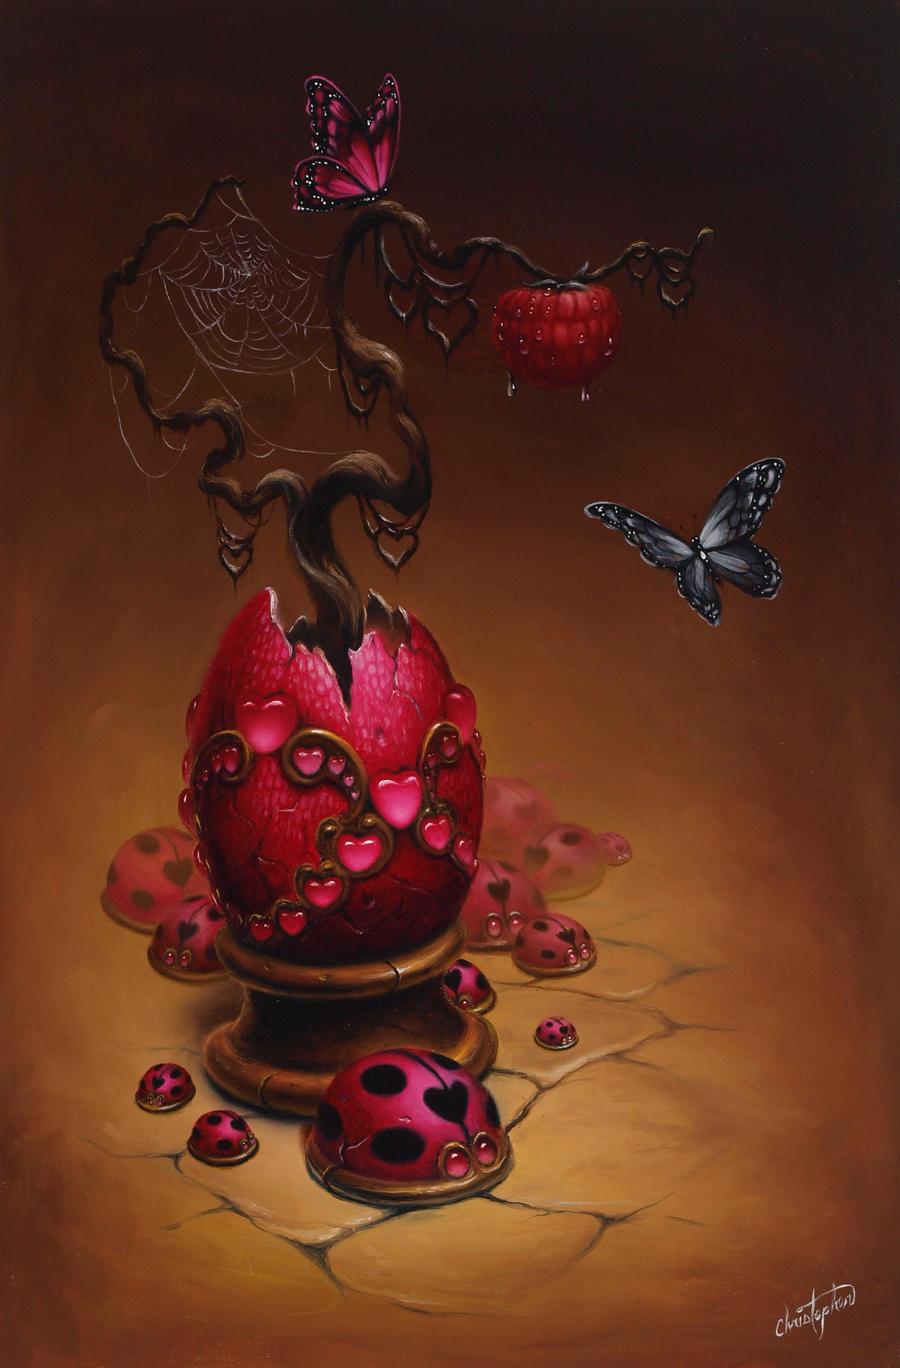 Raspberry Egg by ChristopherPollari